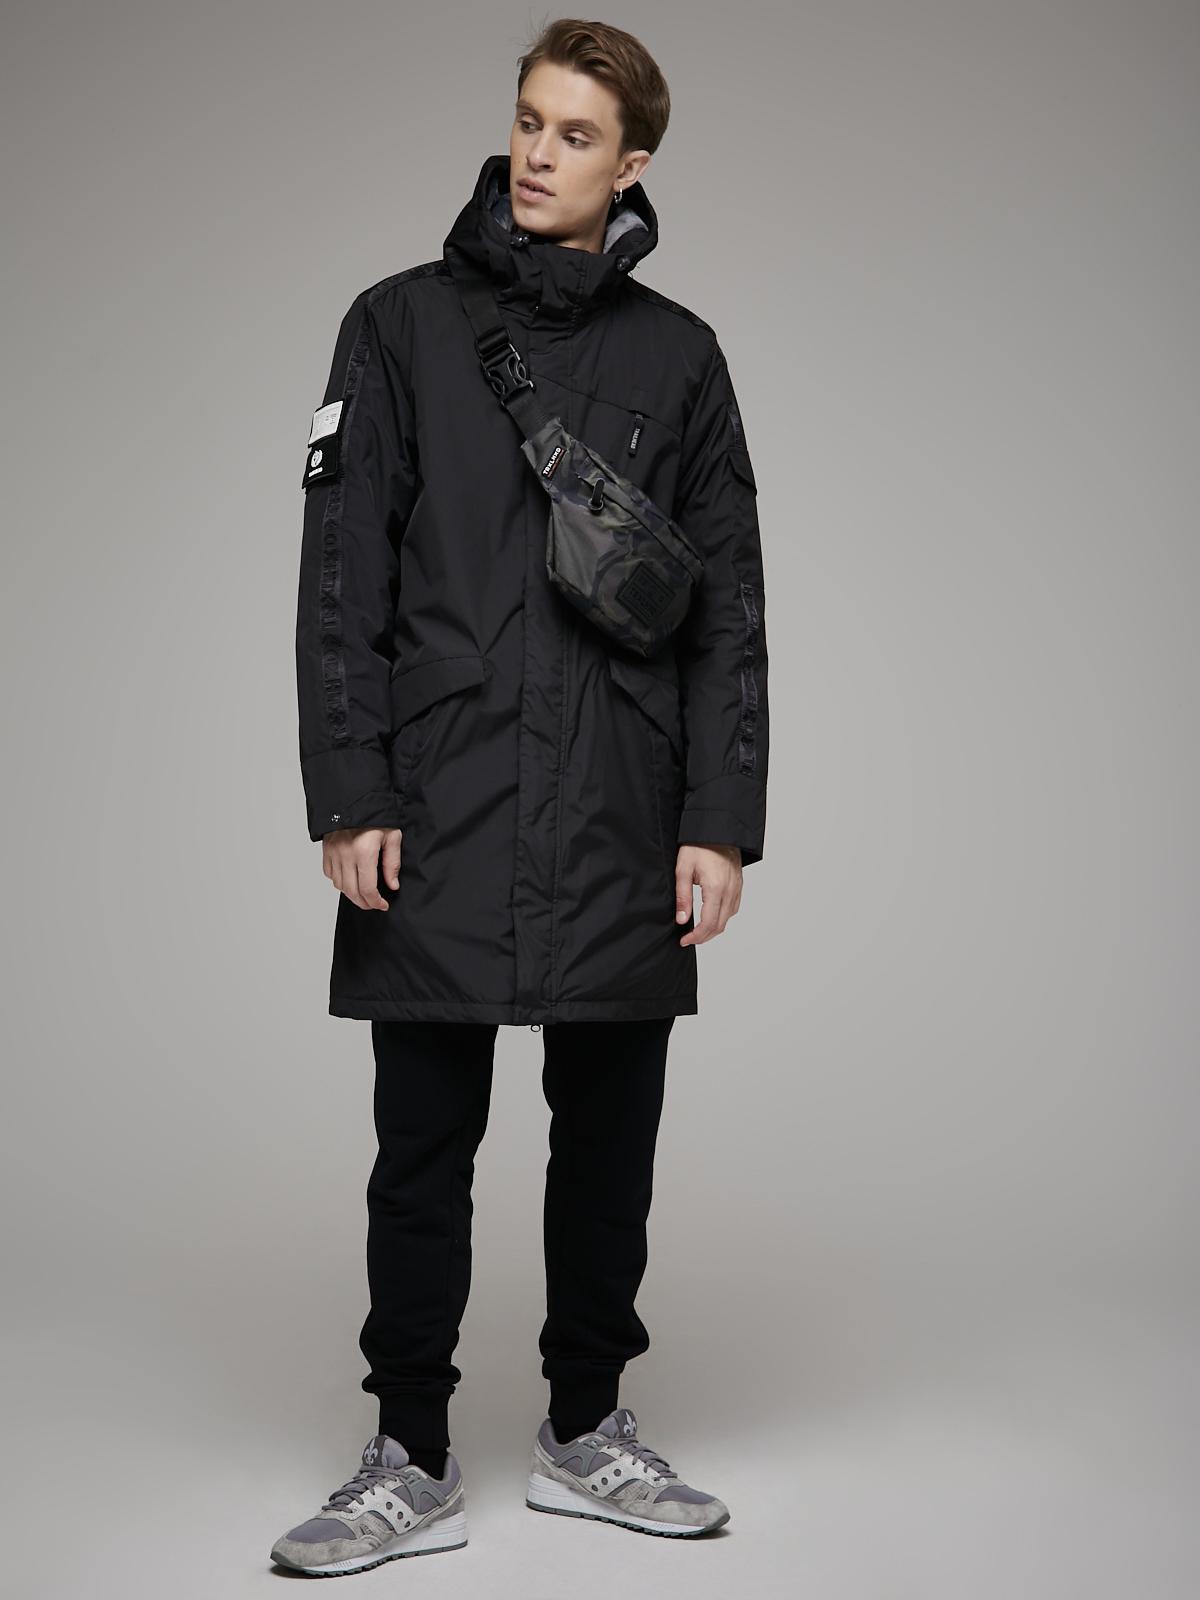 Куртка TRAILHEAD trailhead trailhead homeboy black